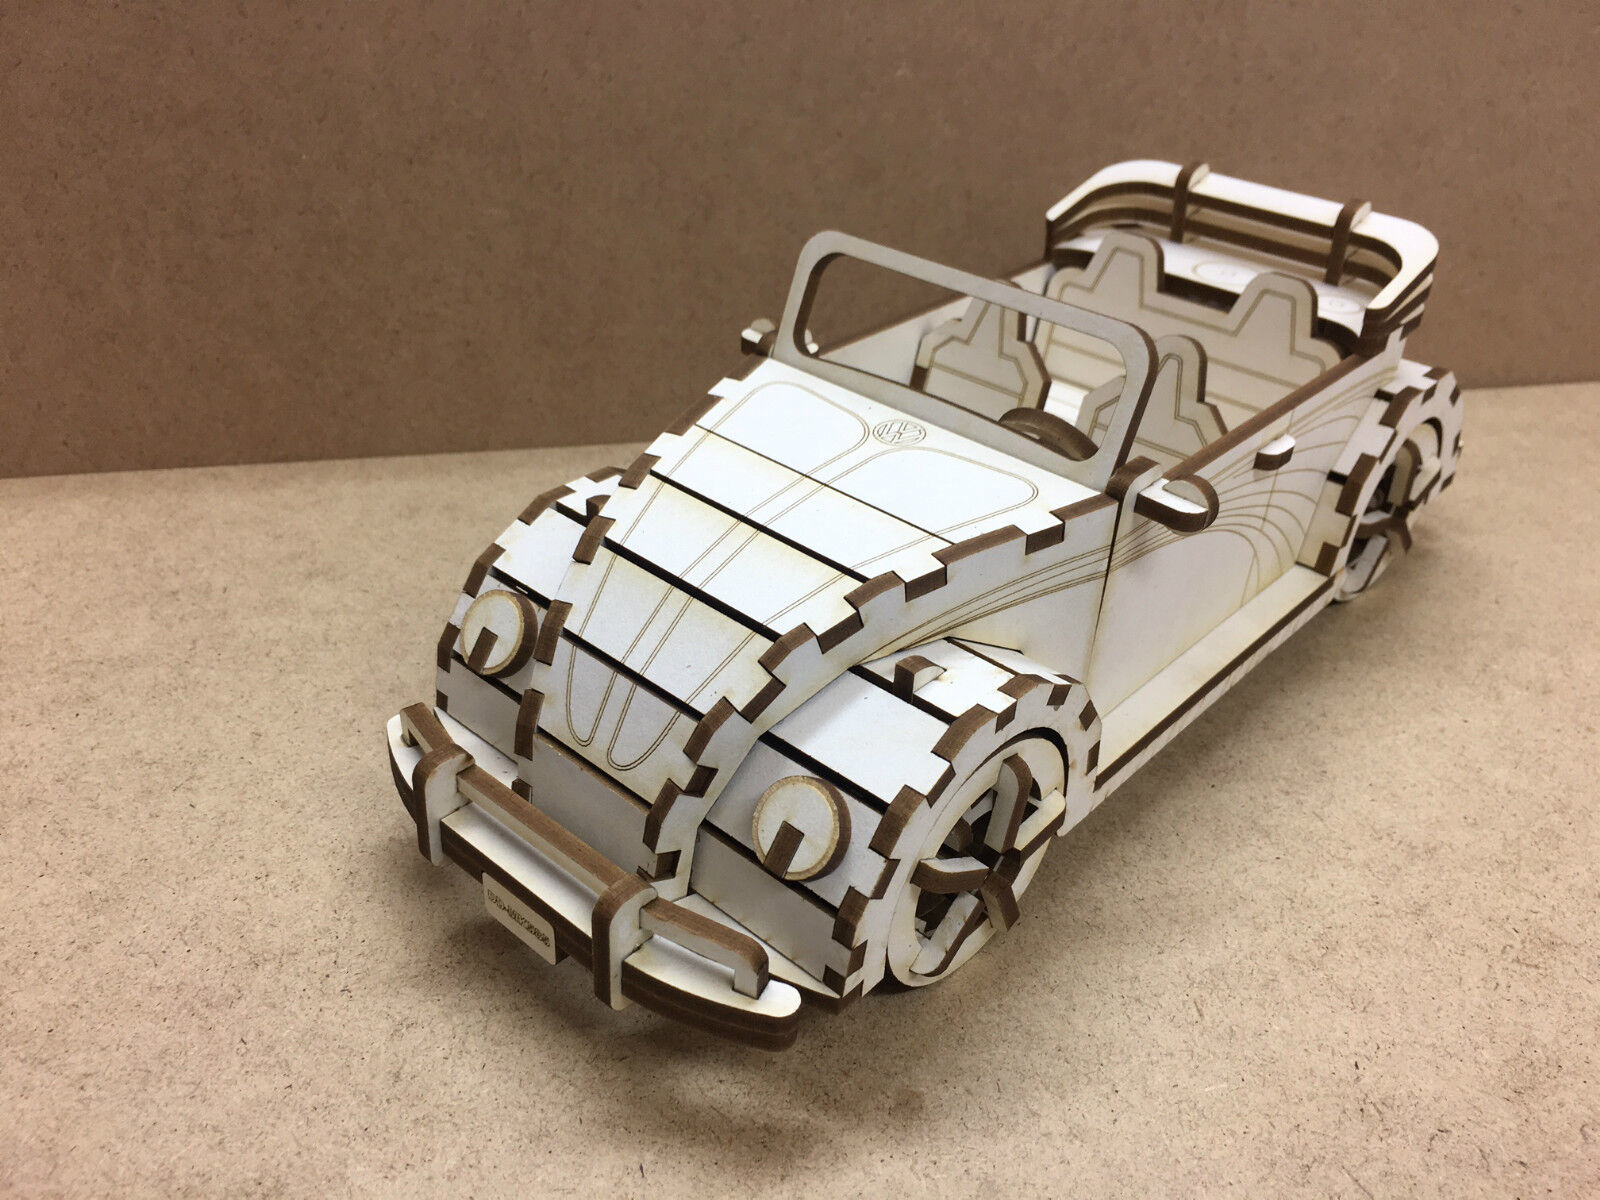 GARAGE VW Beetle 23 ODR 30 cm Puzzle Kit Cabrio Beetle